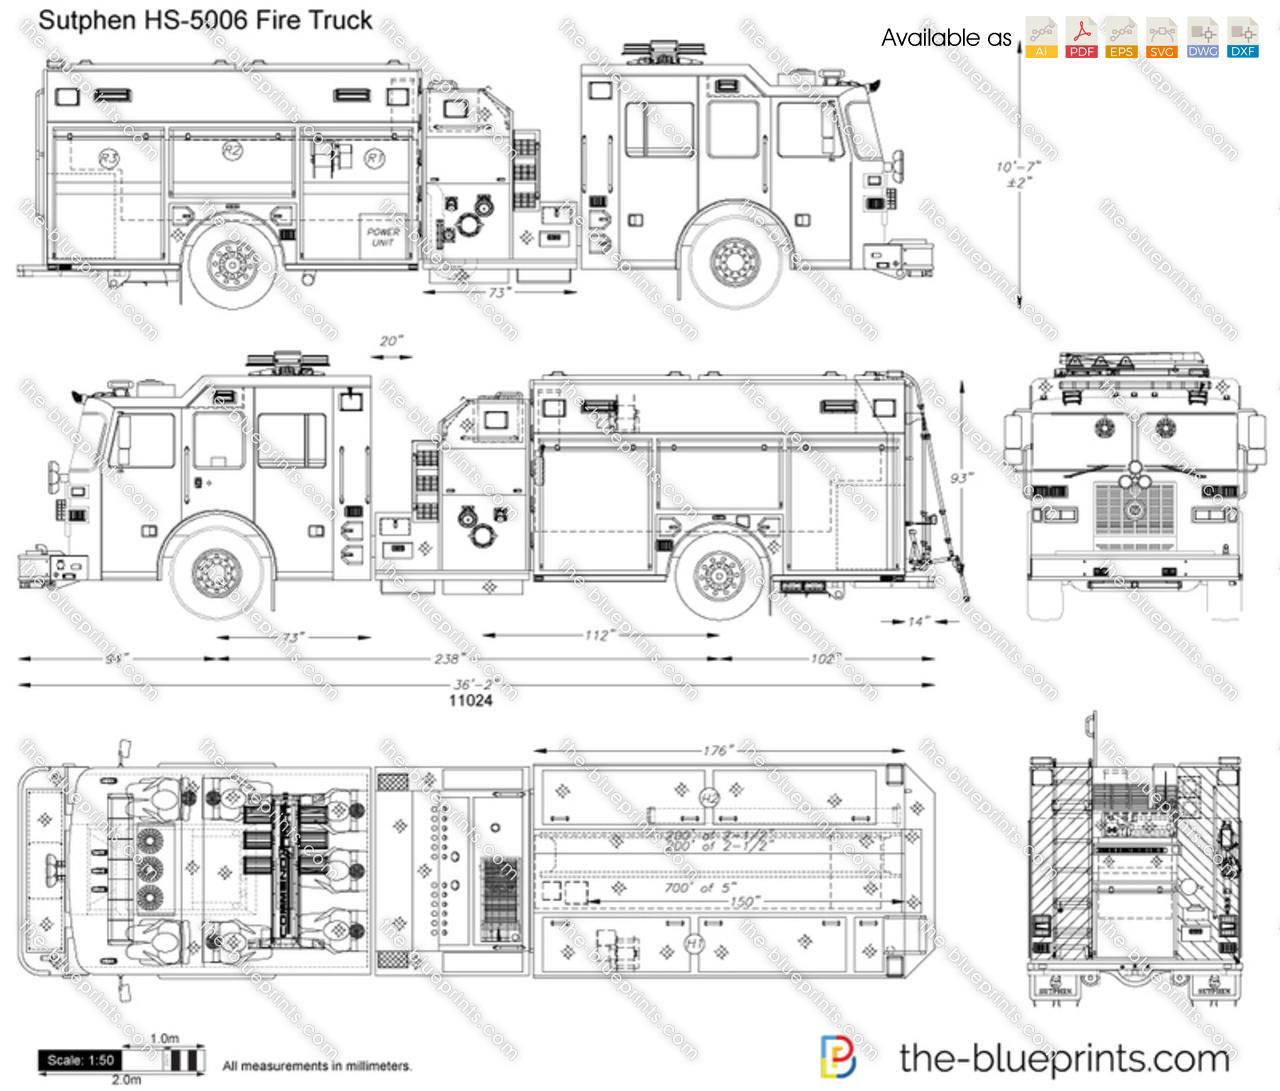 Sutphen HS-5006 Fire Truck